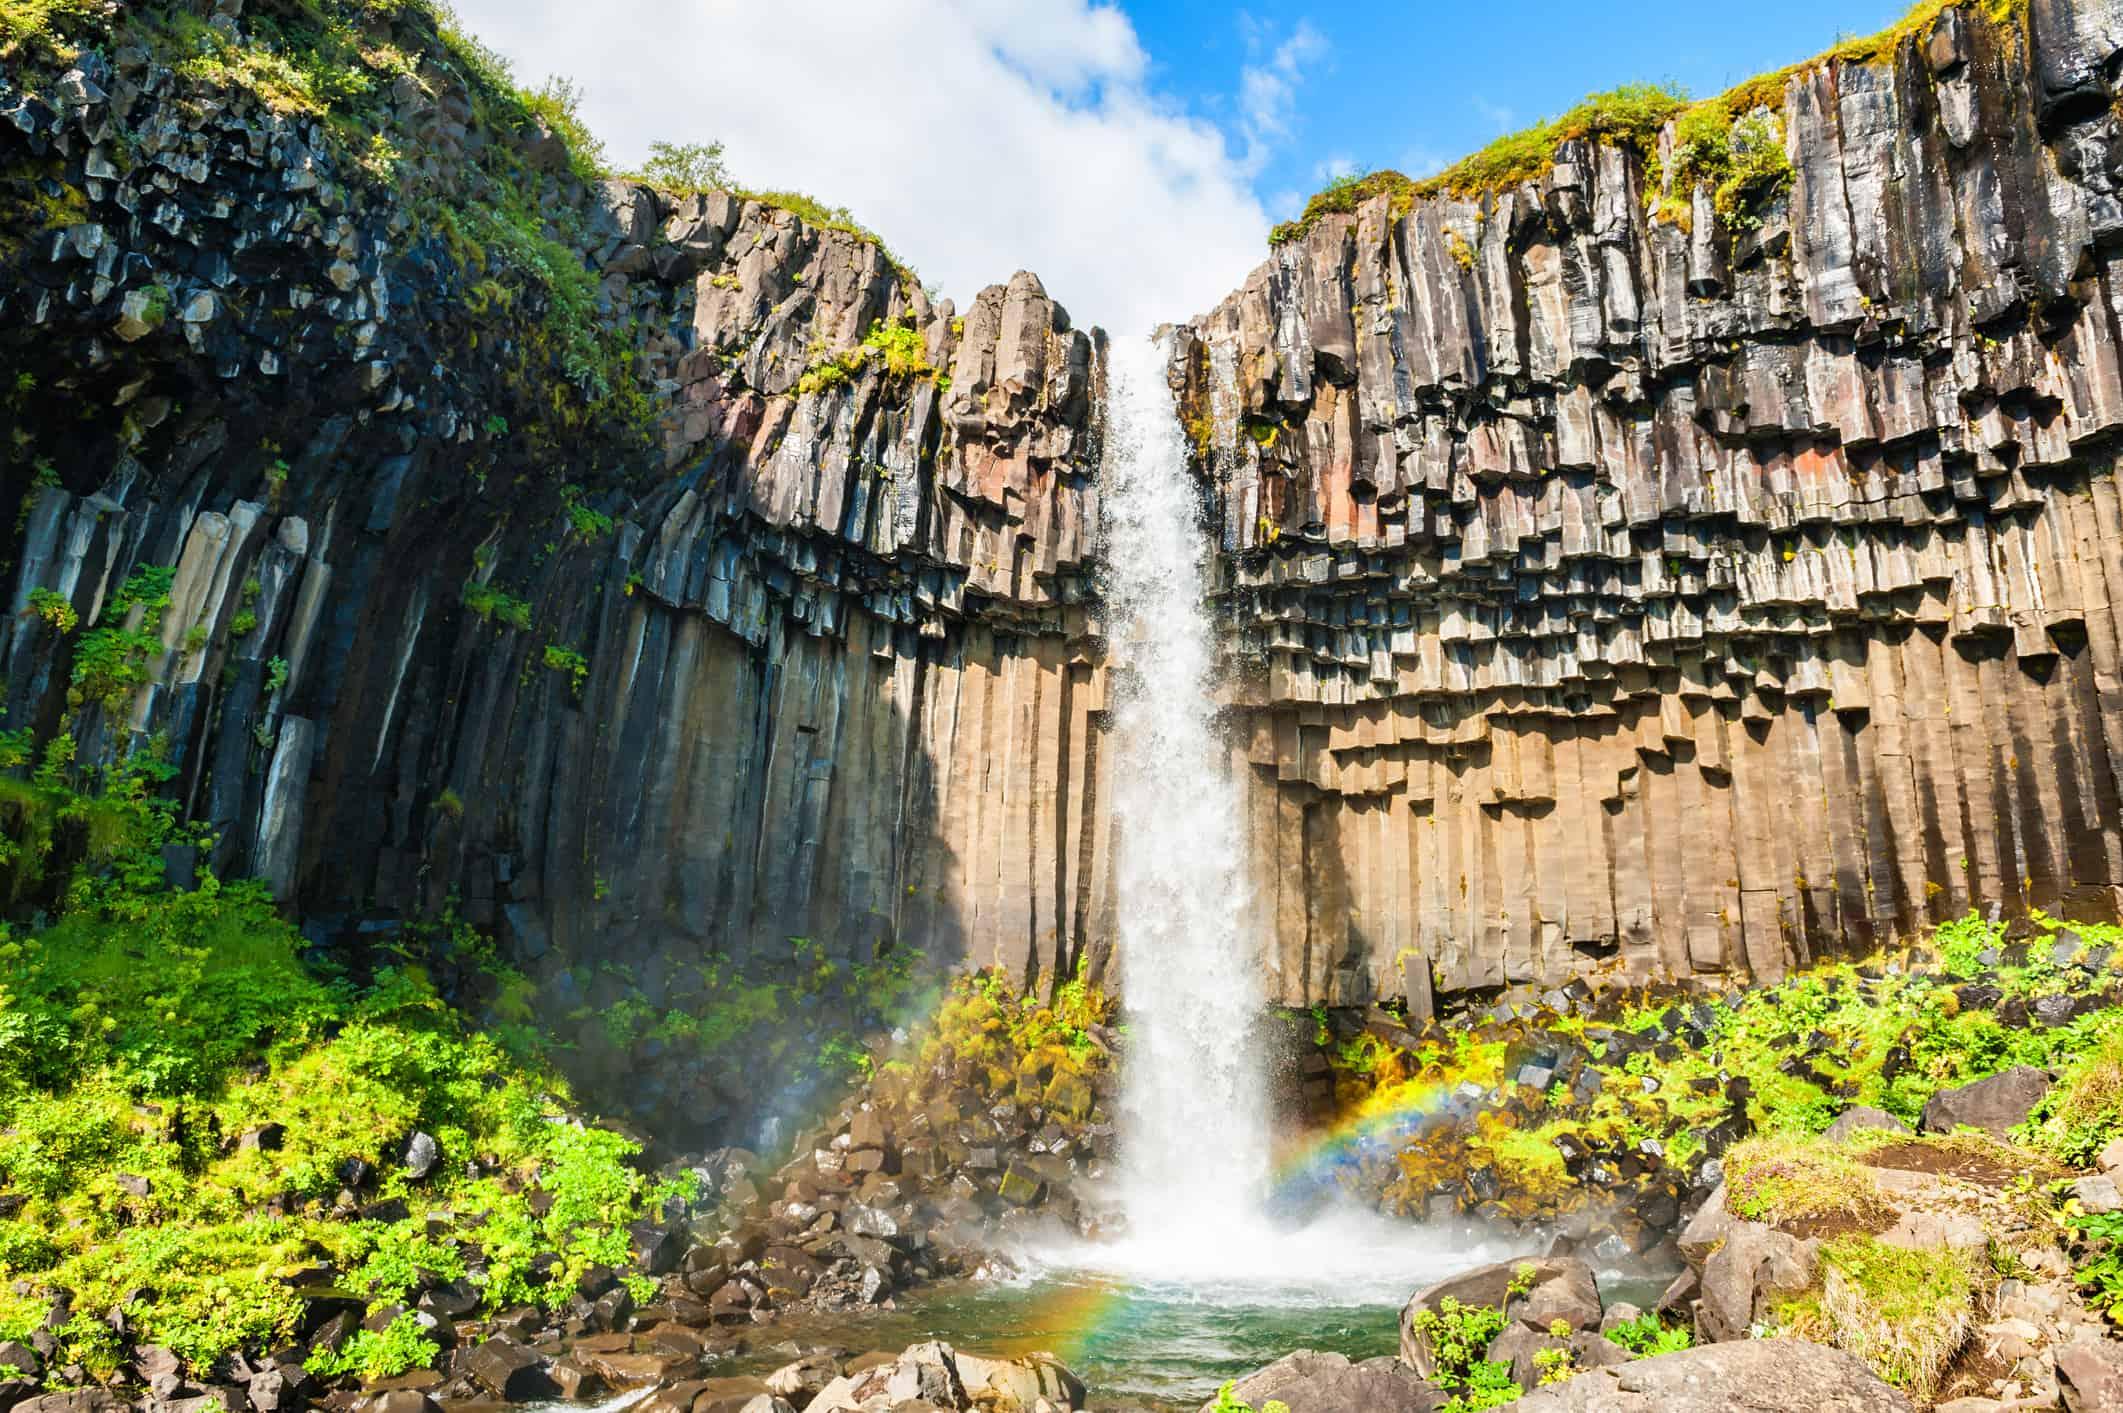 Svartifoss waterfall in Skaftafell national park, Iceland.